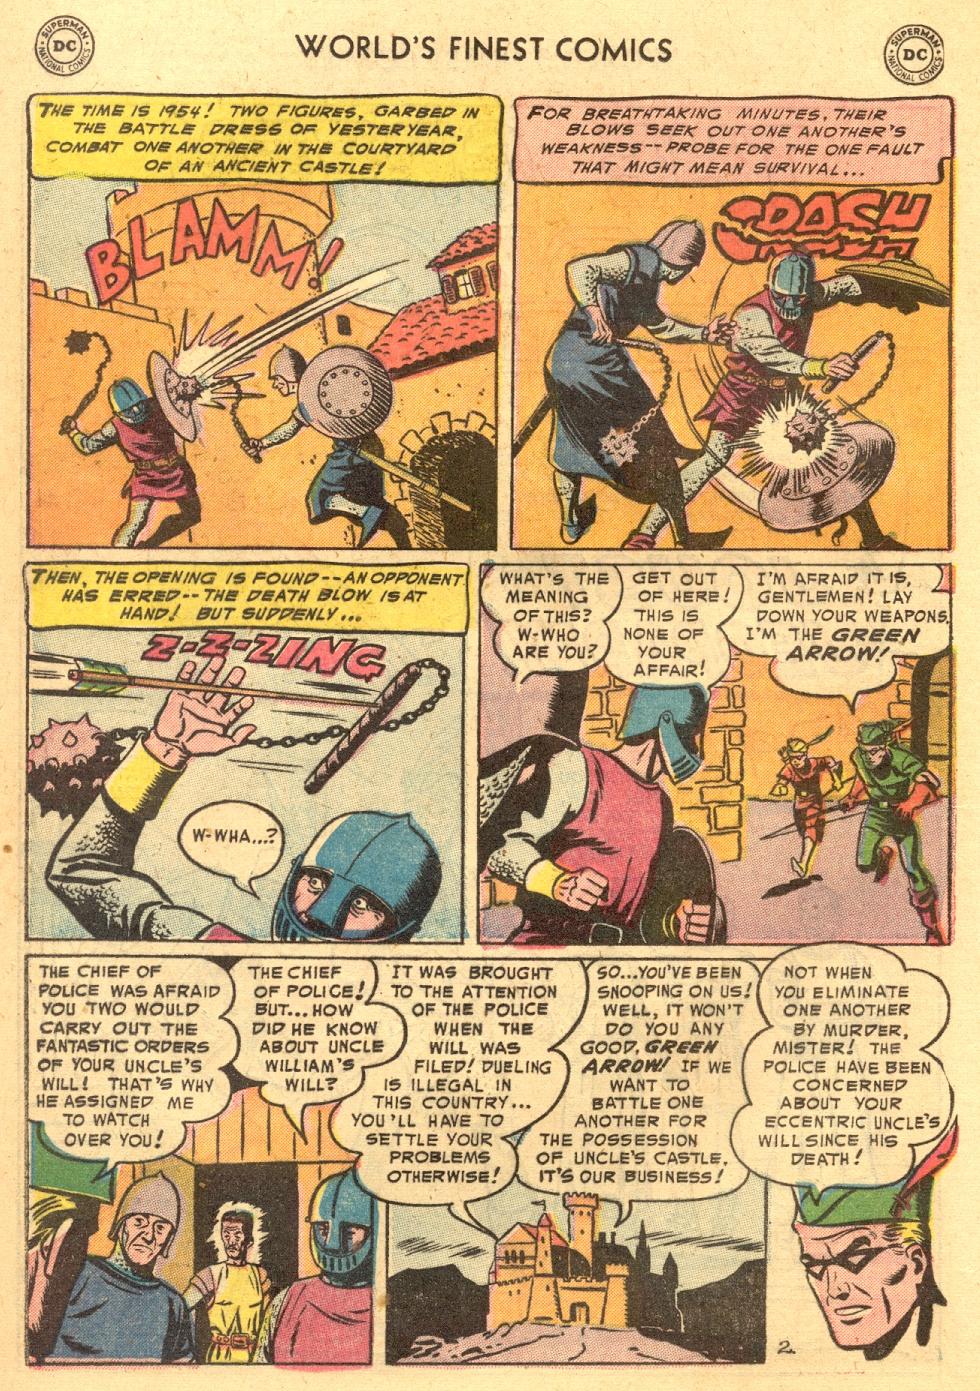 Read online World's Finest Comics comic -  Issue #70 - 22